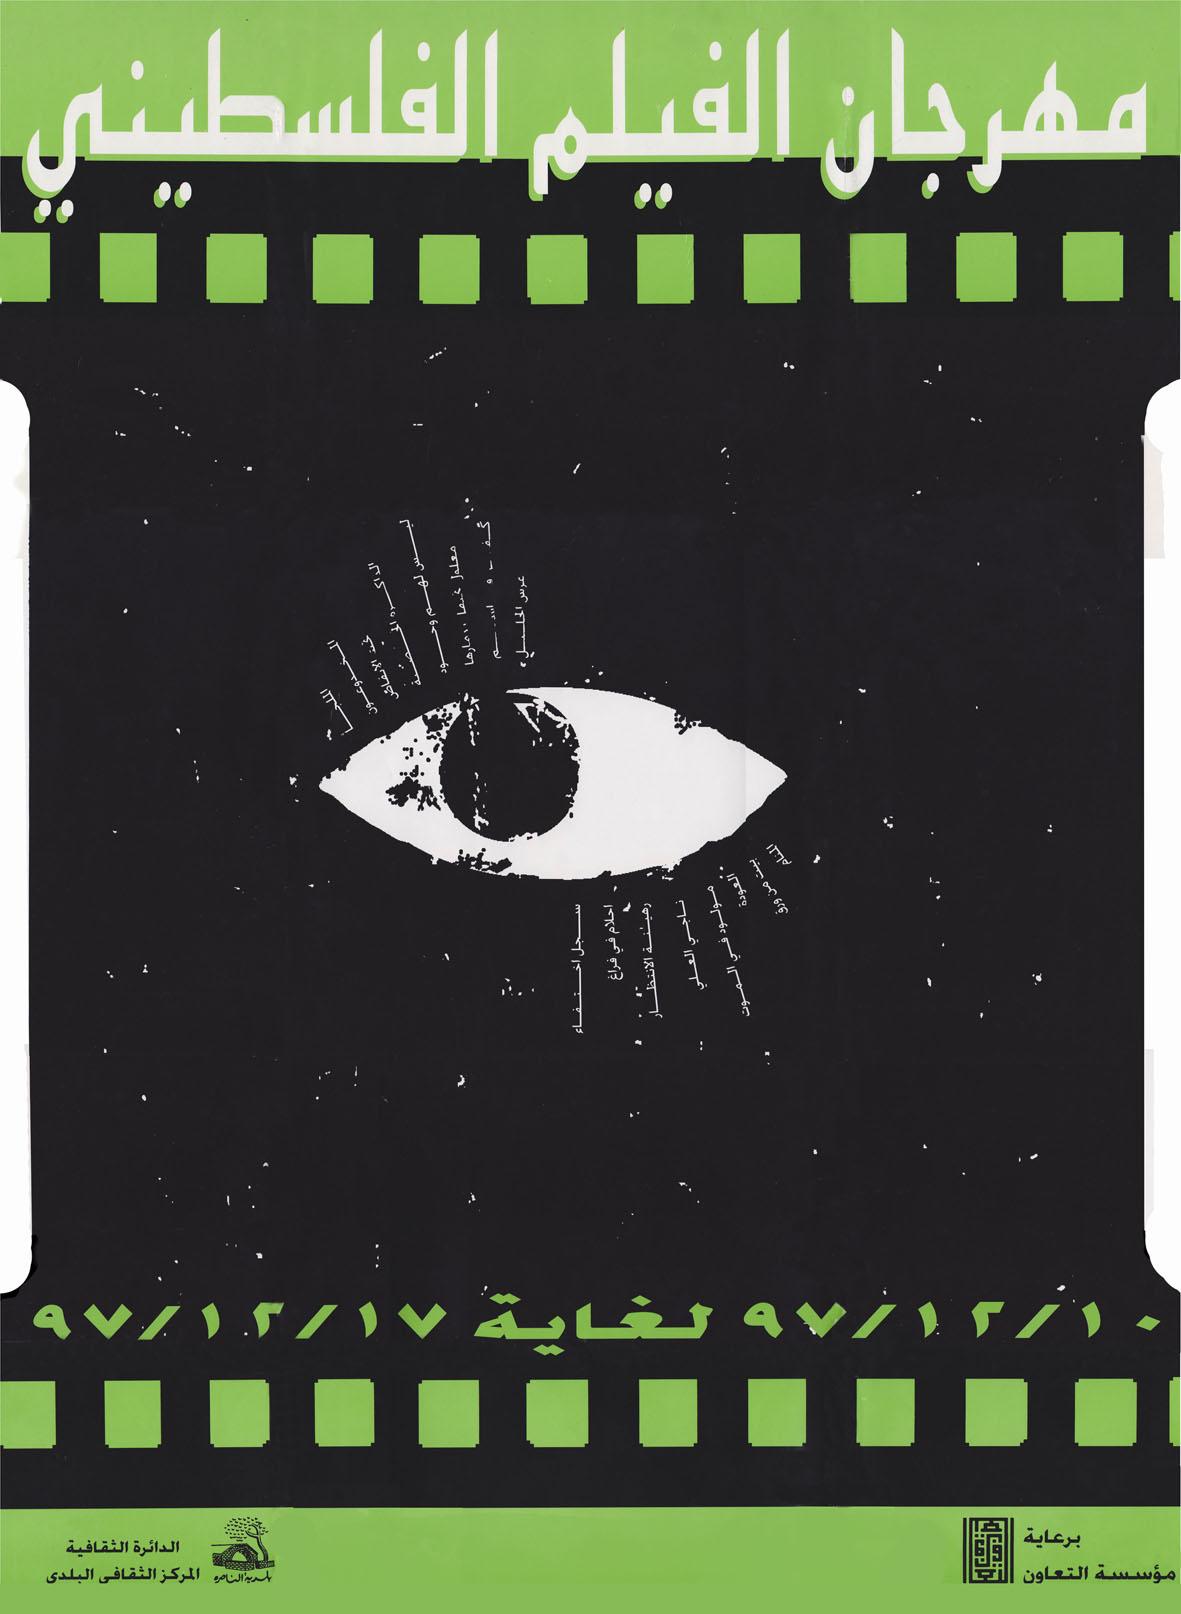 Palestinian film festival poster + logo